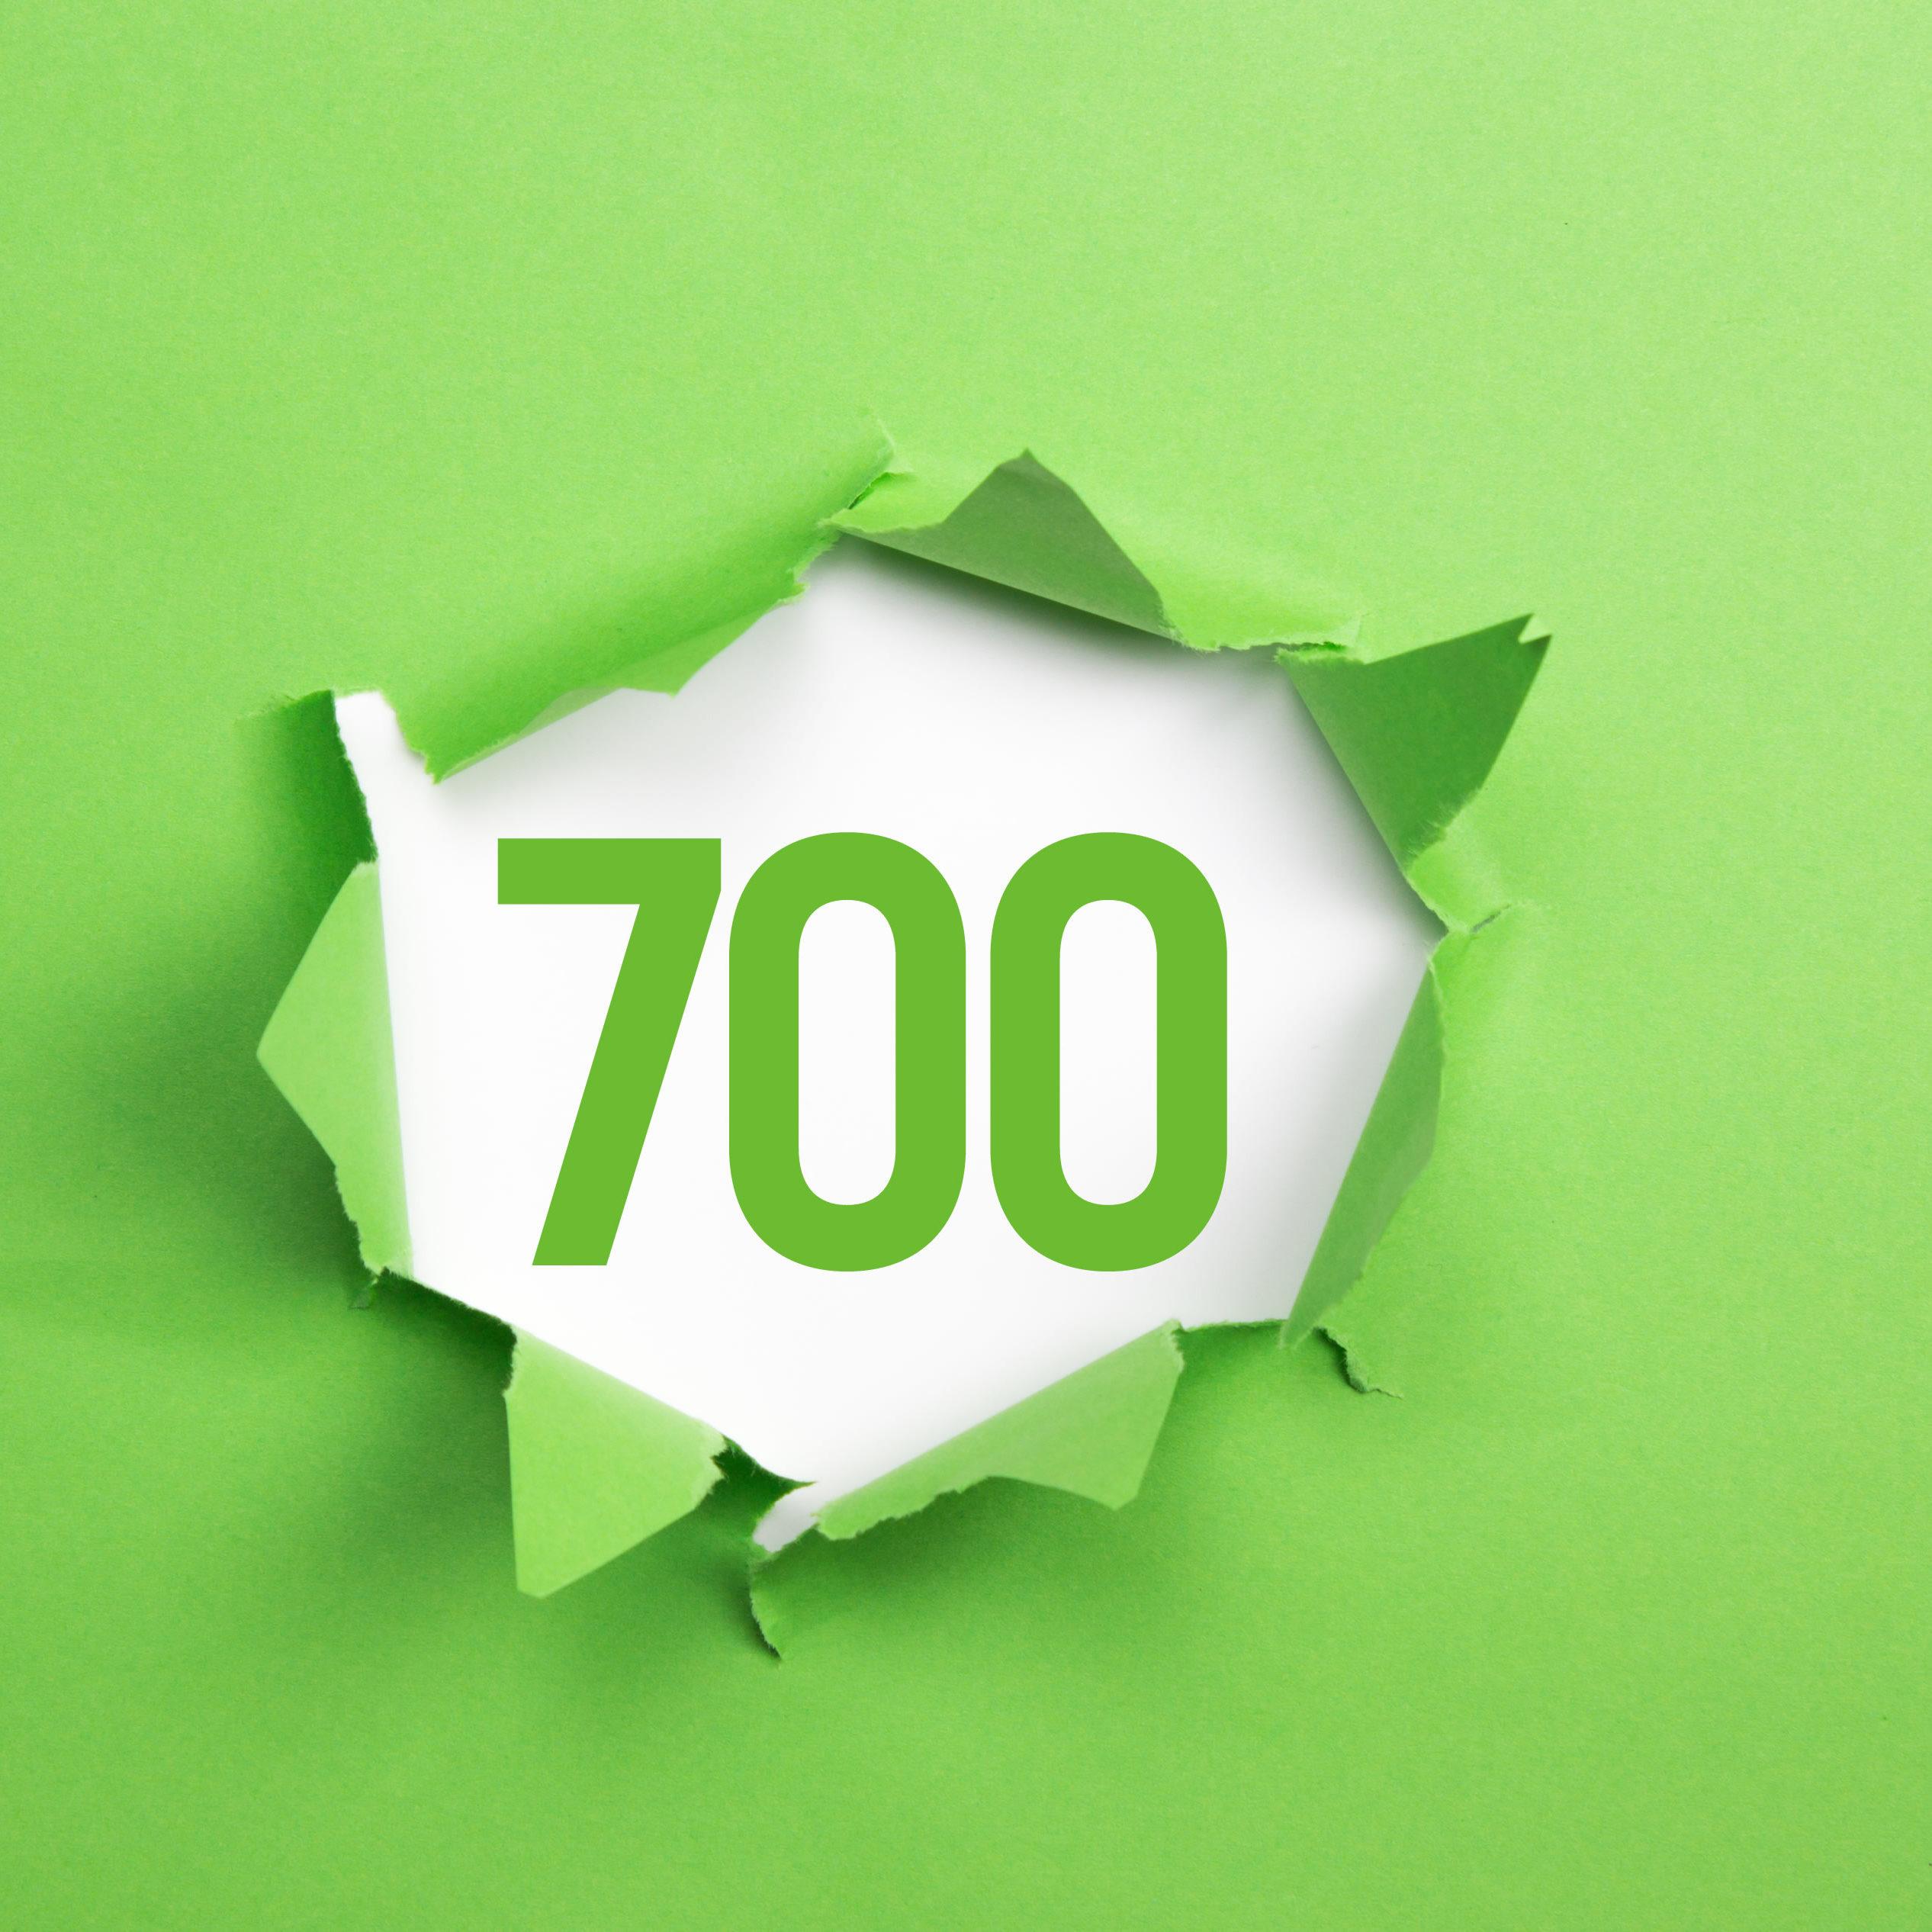 gruene Nummer 700 auf gruenem Papier